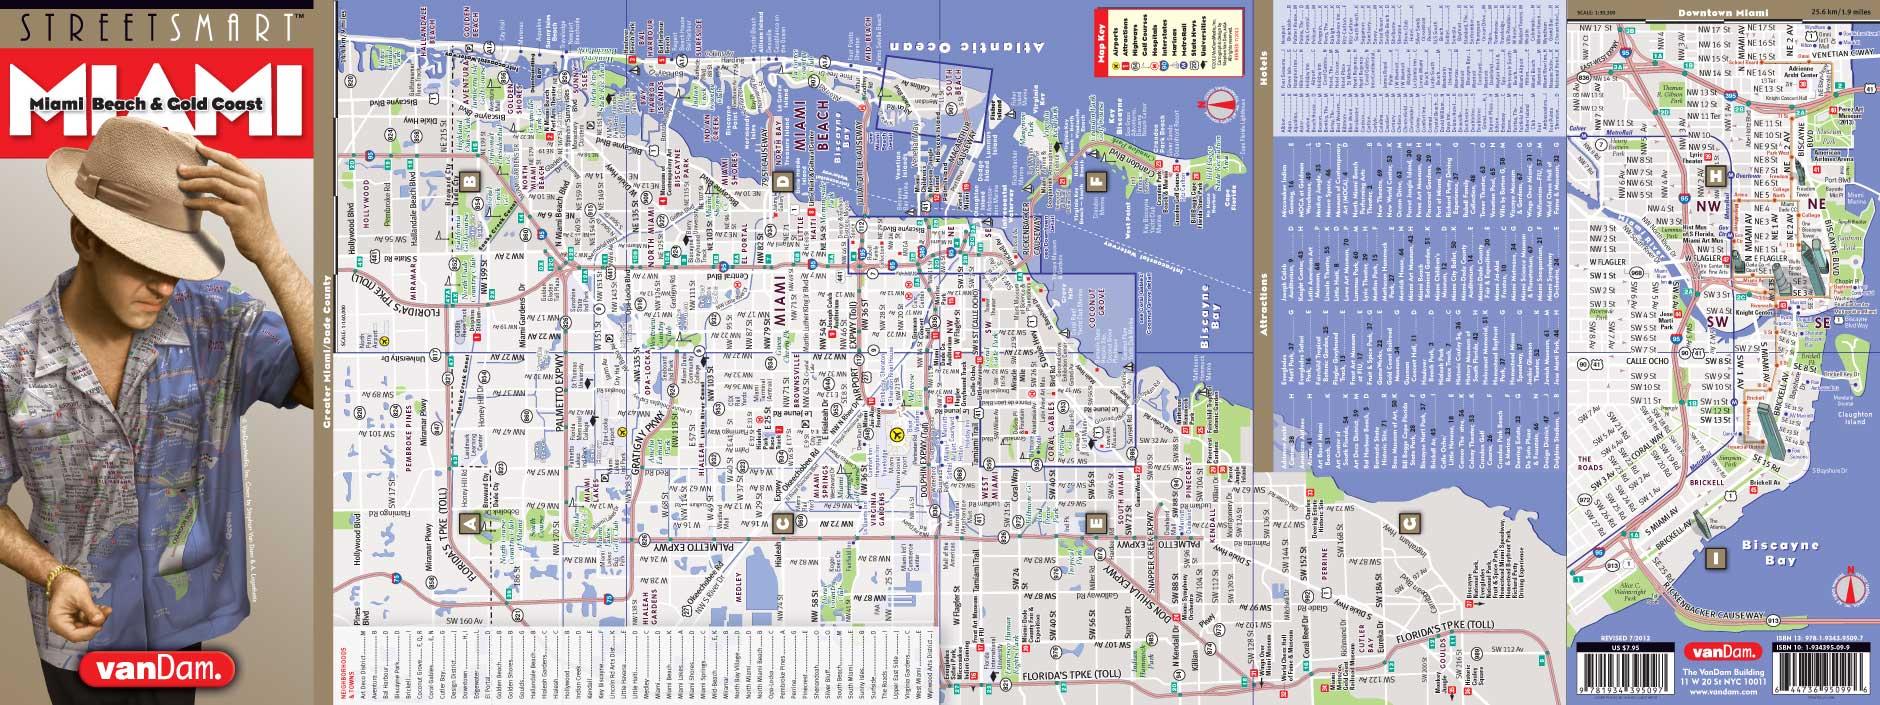 miami mapvandam   miami streetsmart map   city street